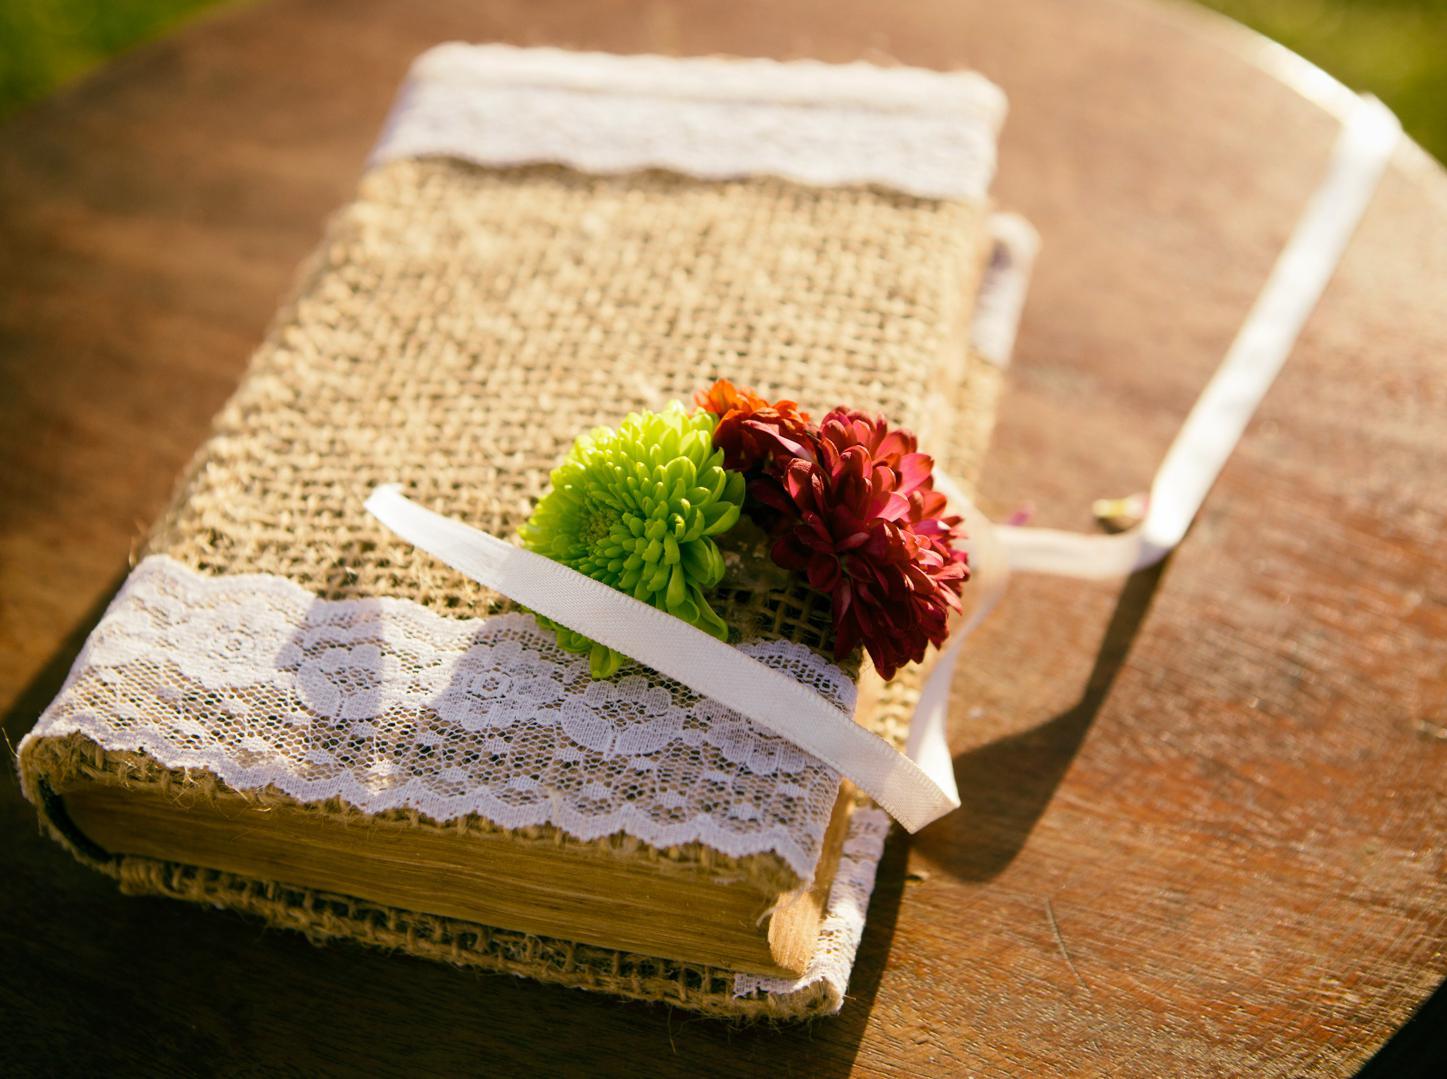 bodas-sin-clasificar-sin-tema-cuba-42042.jpg